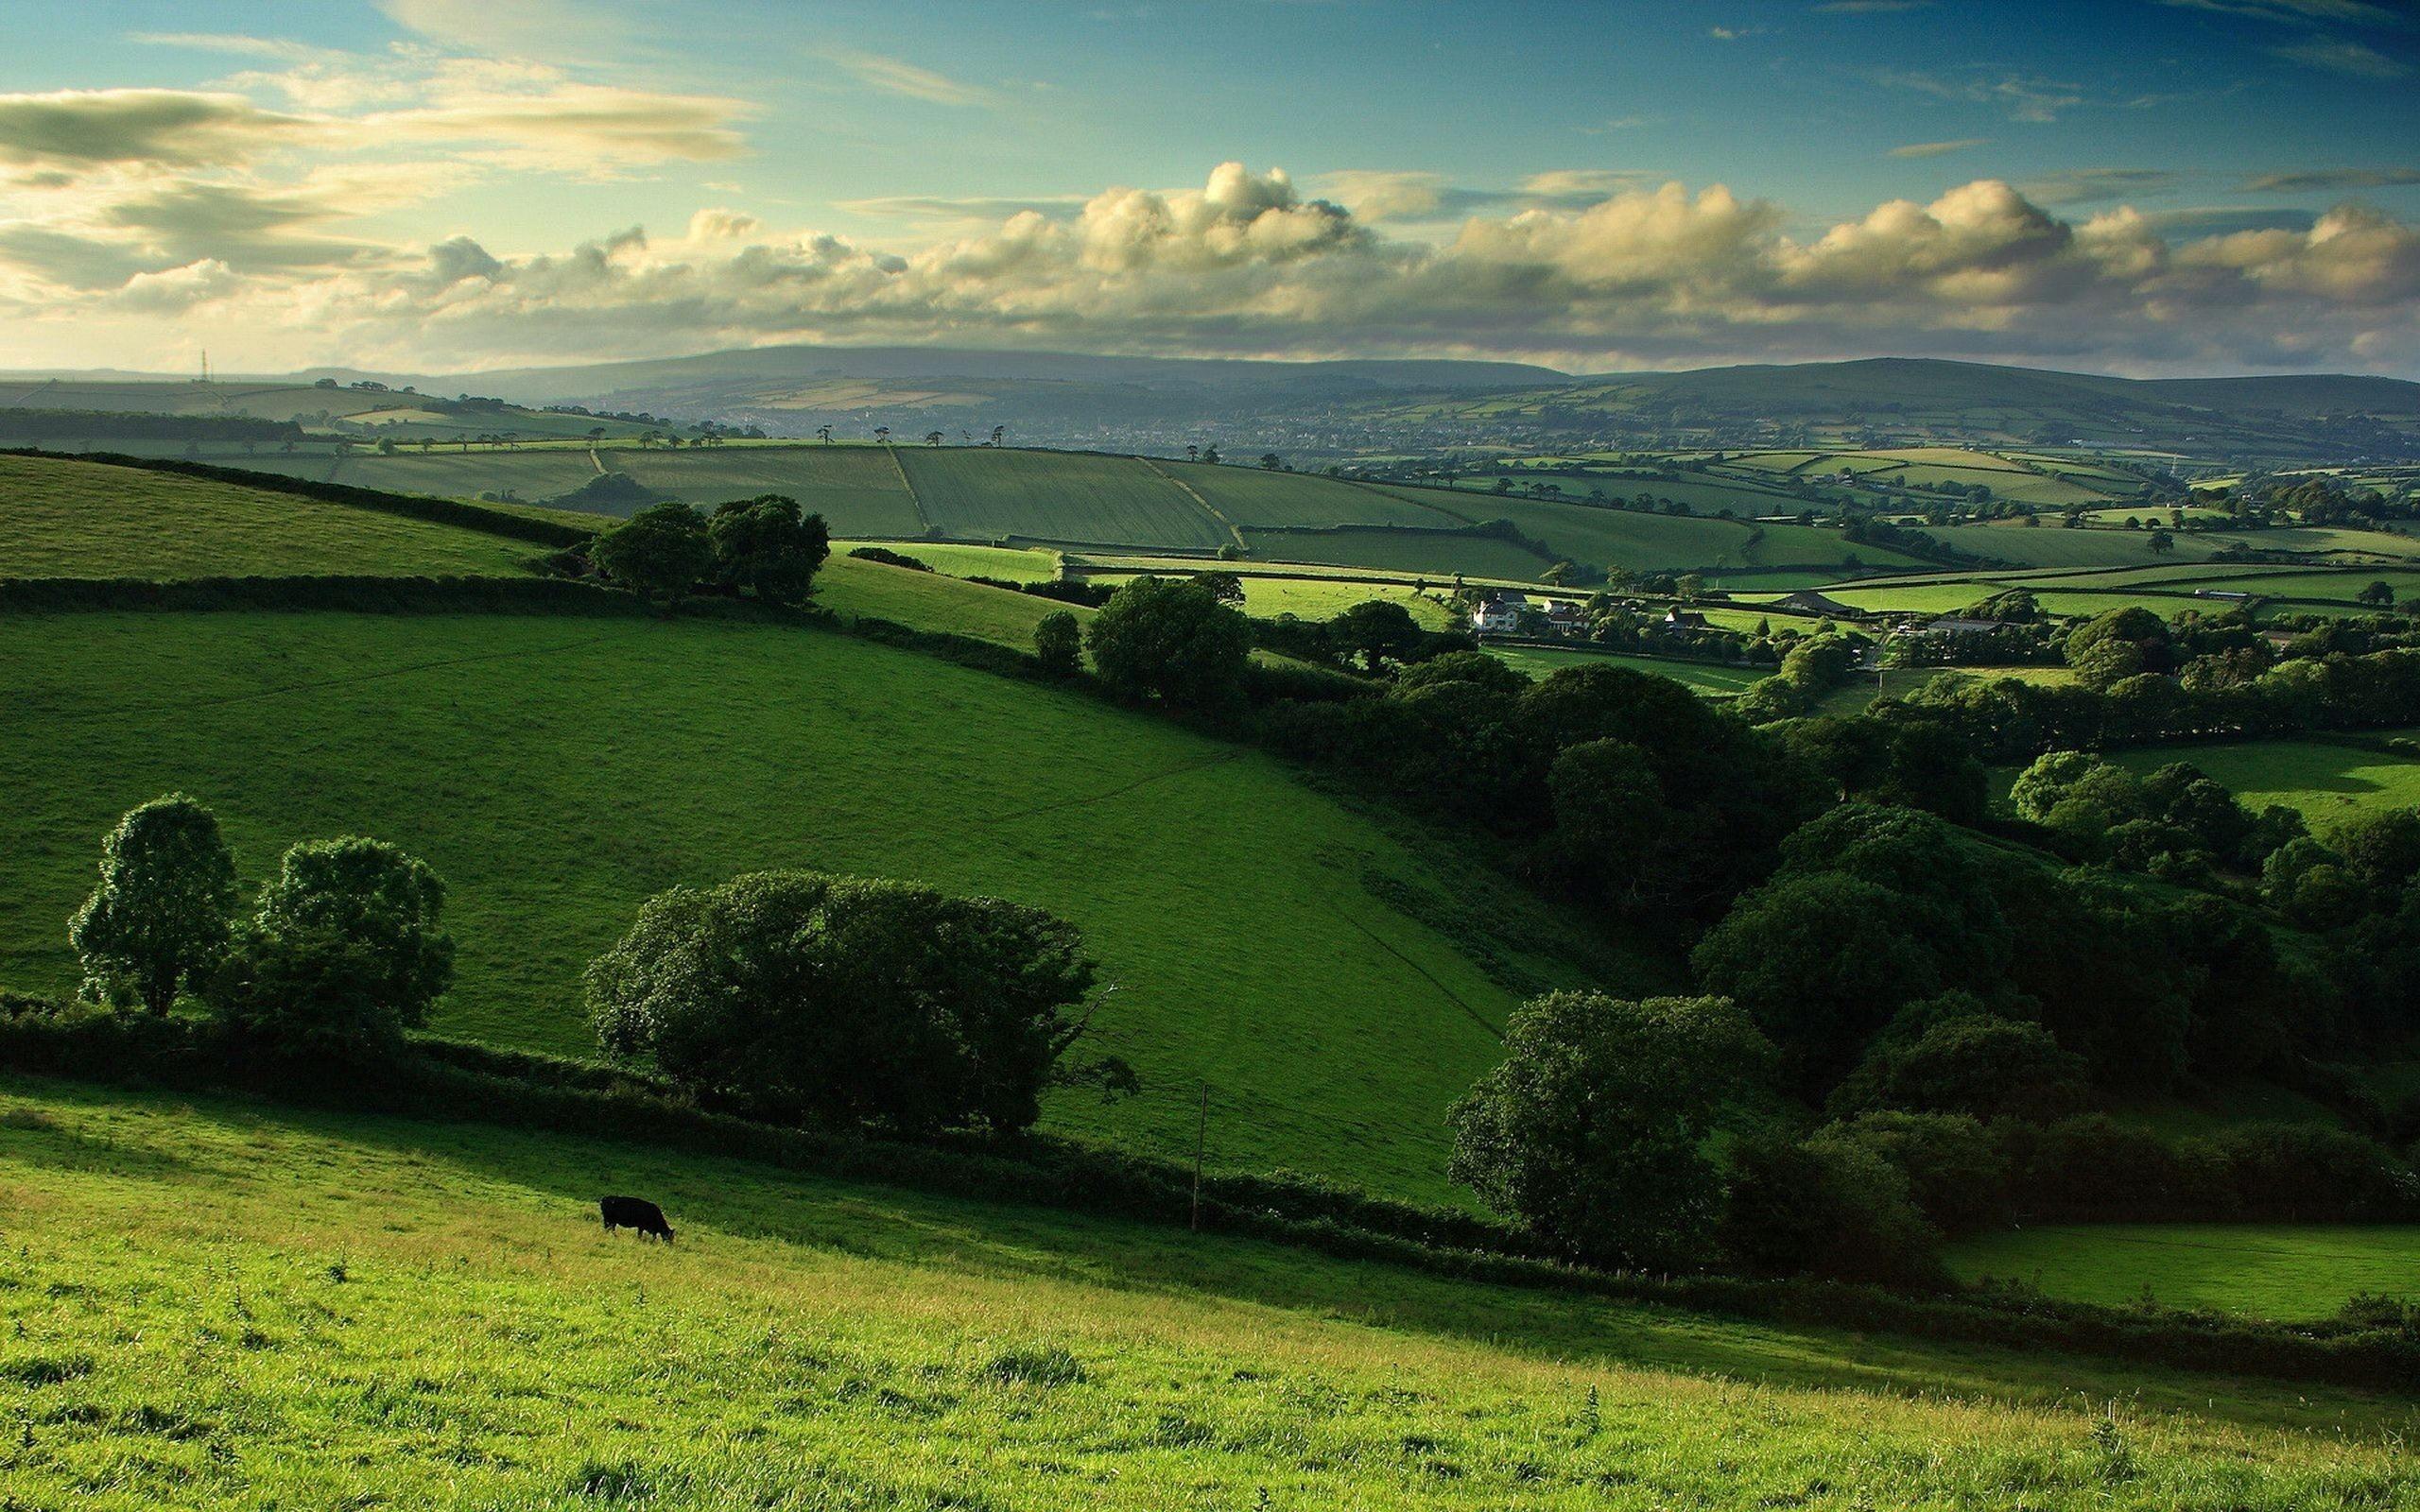 Farm Field Aerial View HD Wallpaper